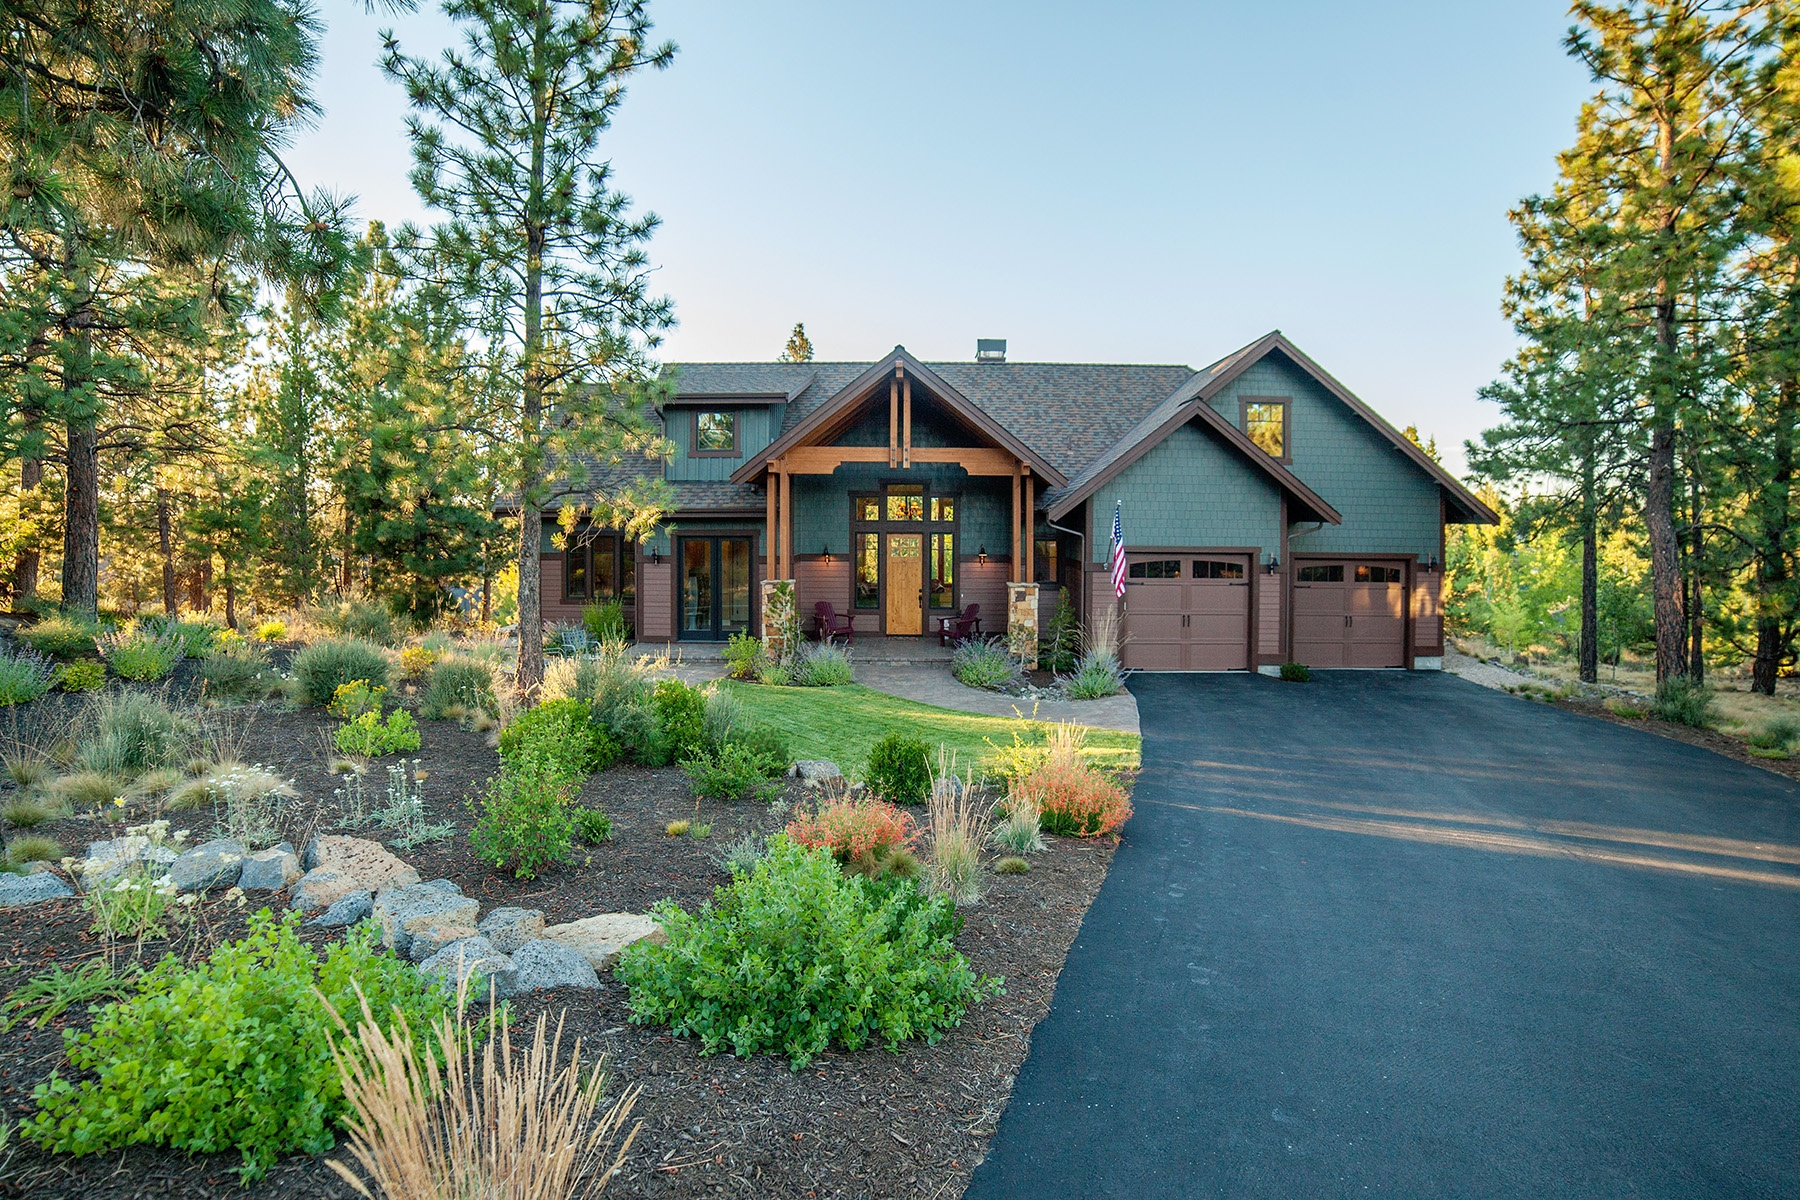 Moradia para Venda às Custom home in 3 Pines w Mtn Views 19152 NW Mt Shasta Ct Bend, Oregon, 97701 Estados Unidos